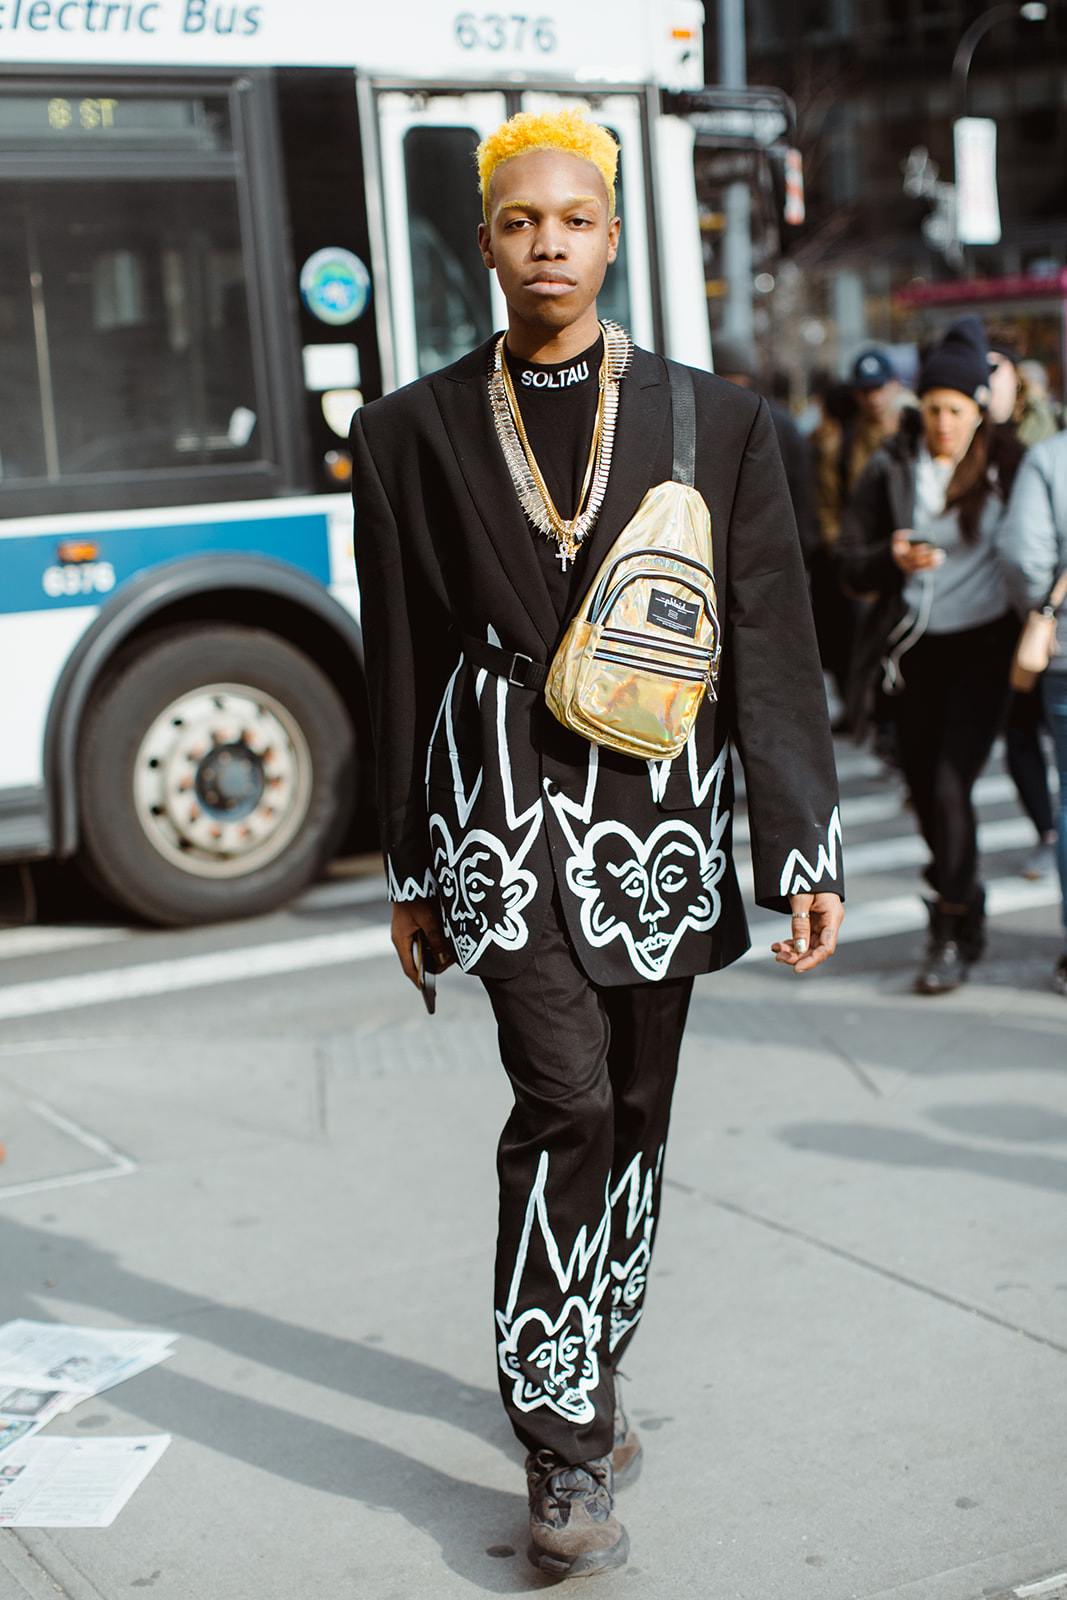 new york city fashion photographer-5.jpg